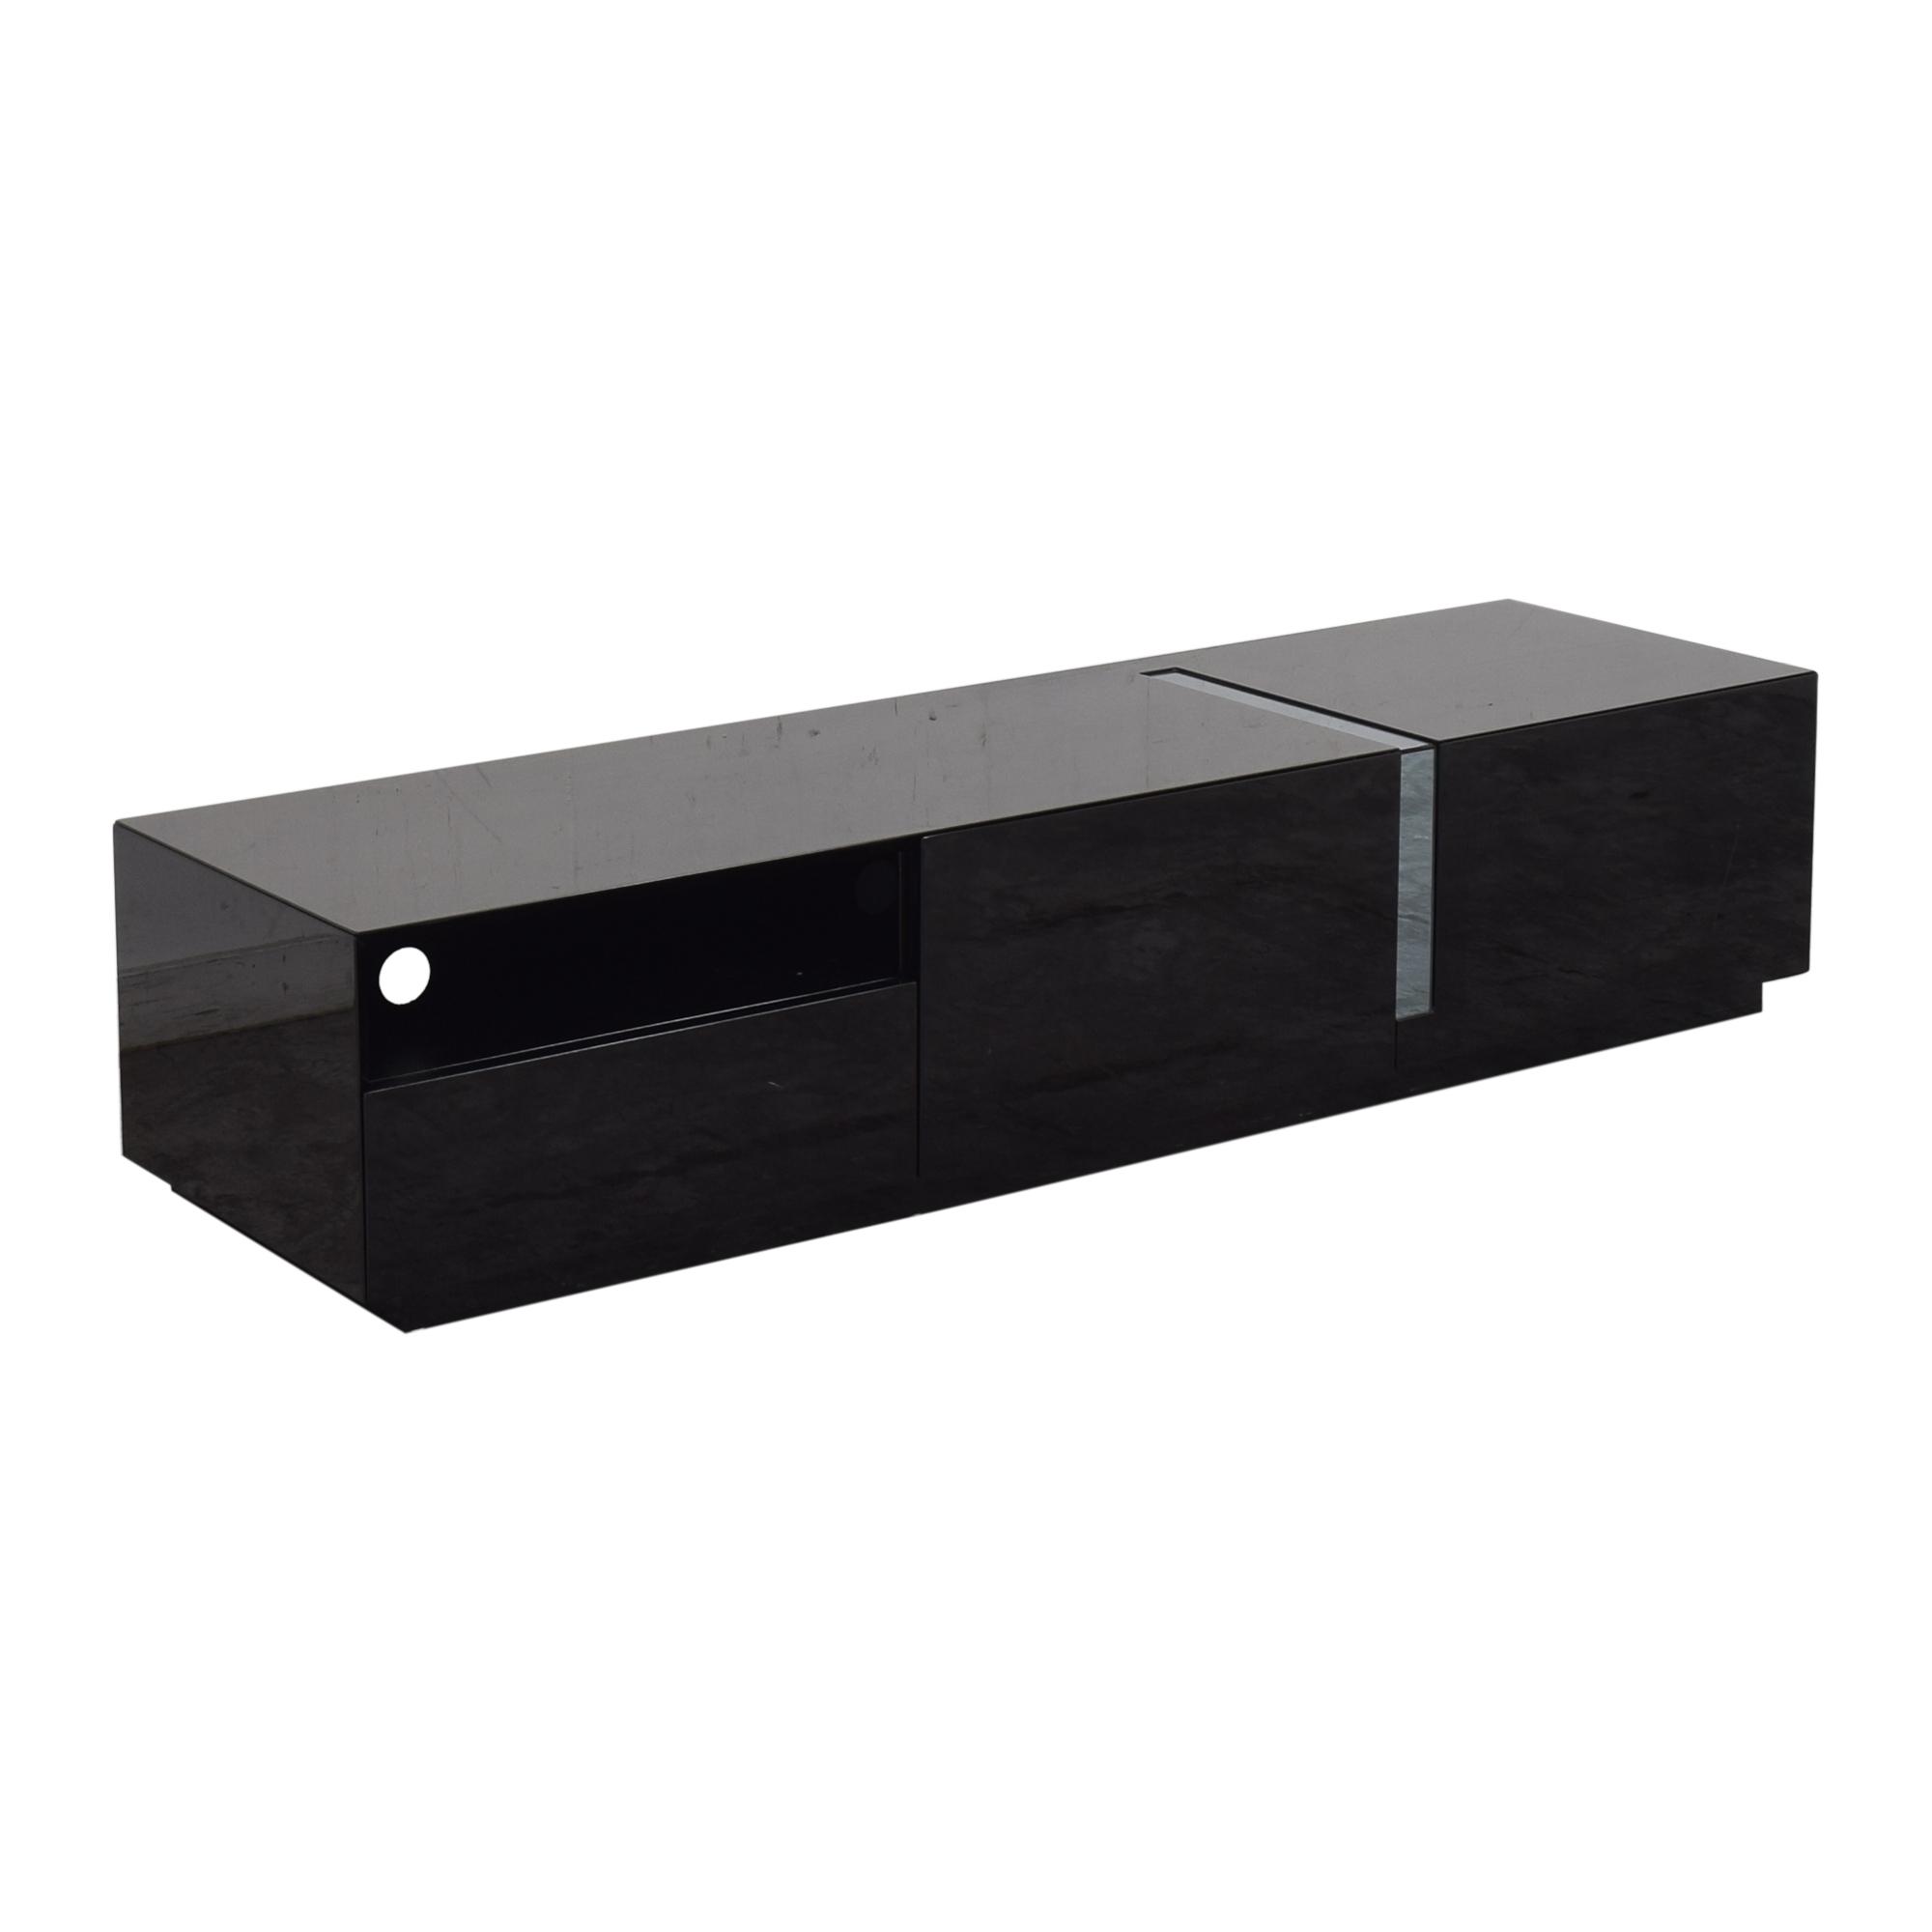 shop J&M Furniture J&M Furniture Modern TV Stand online